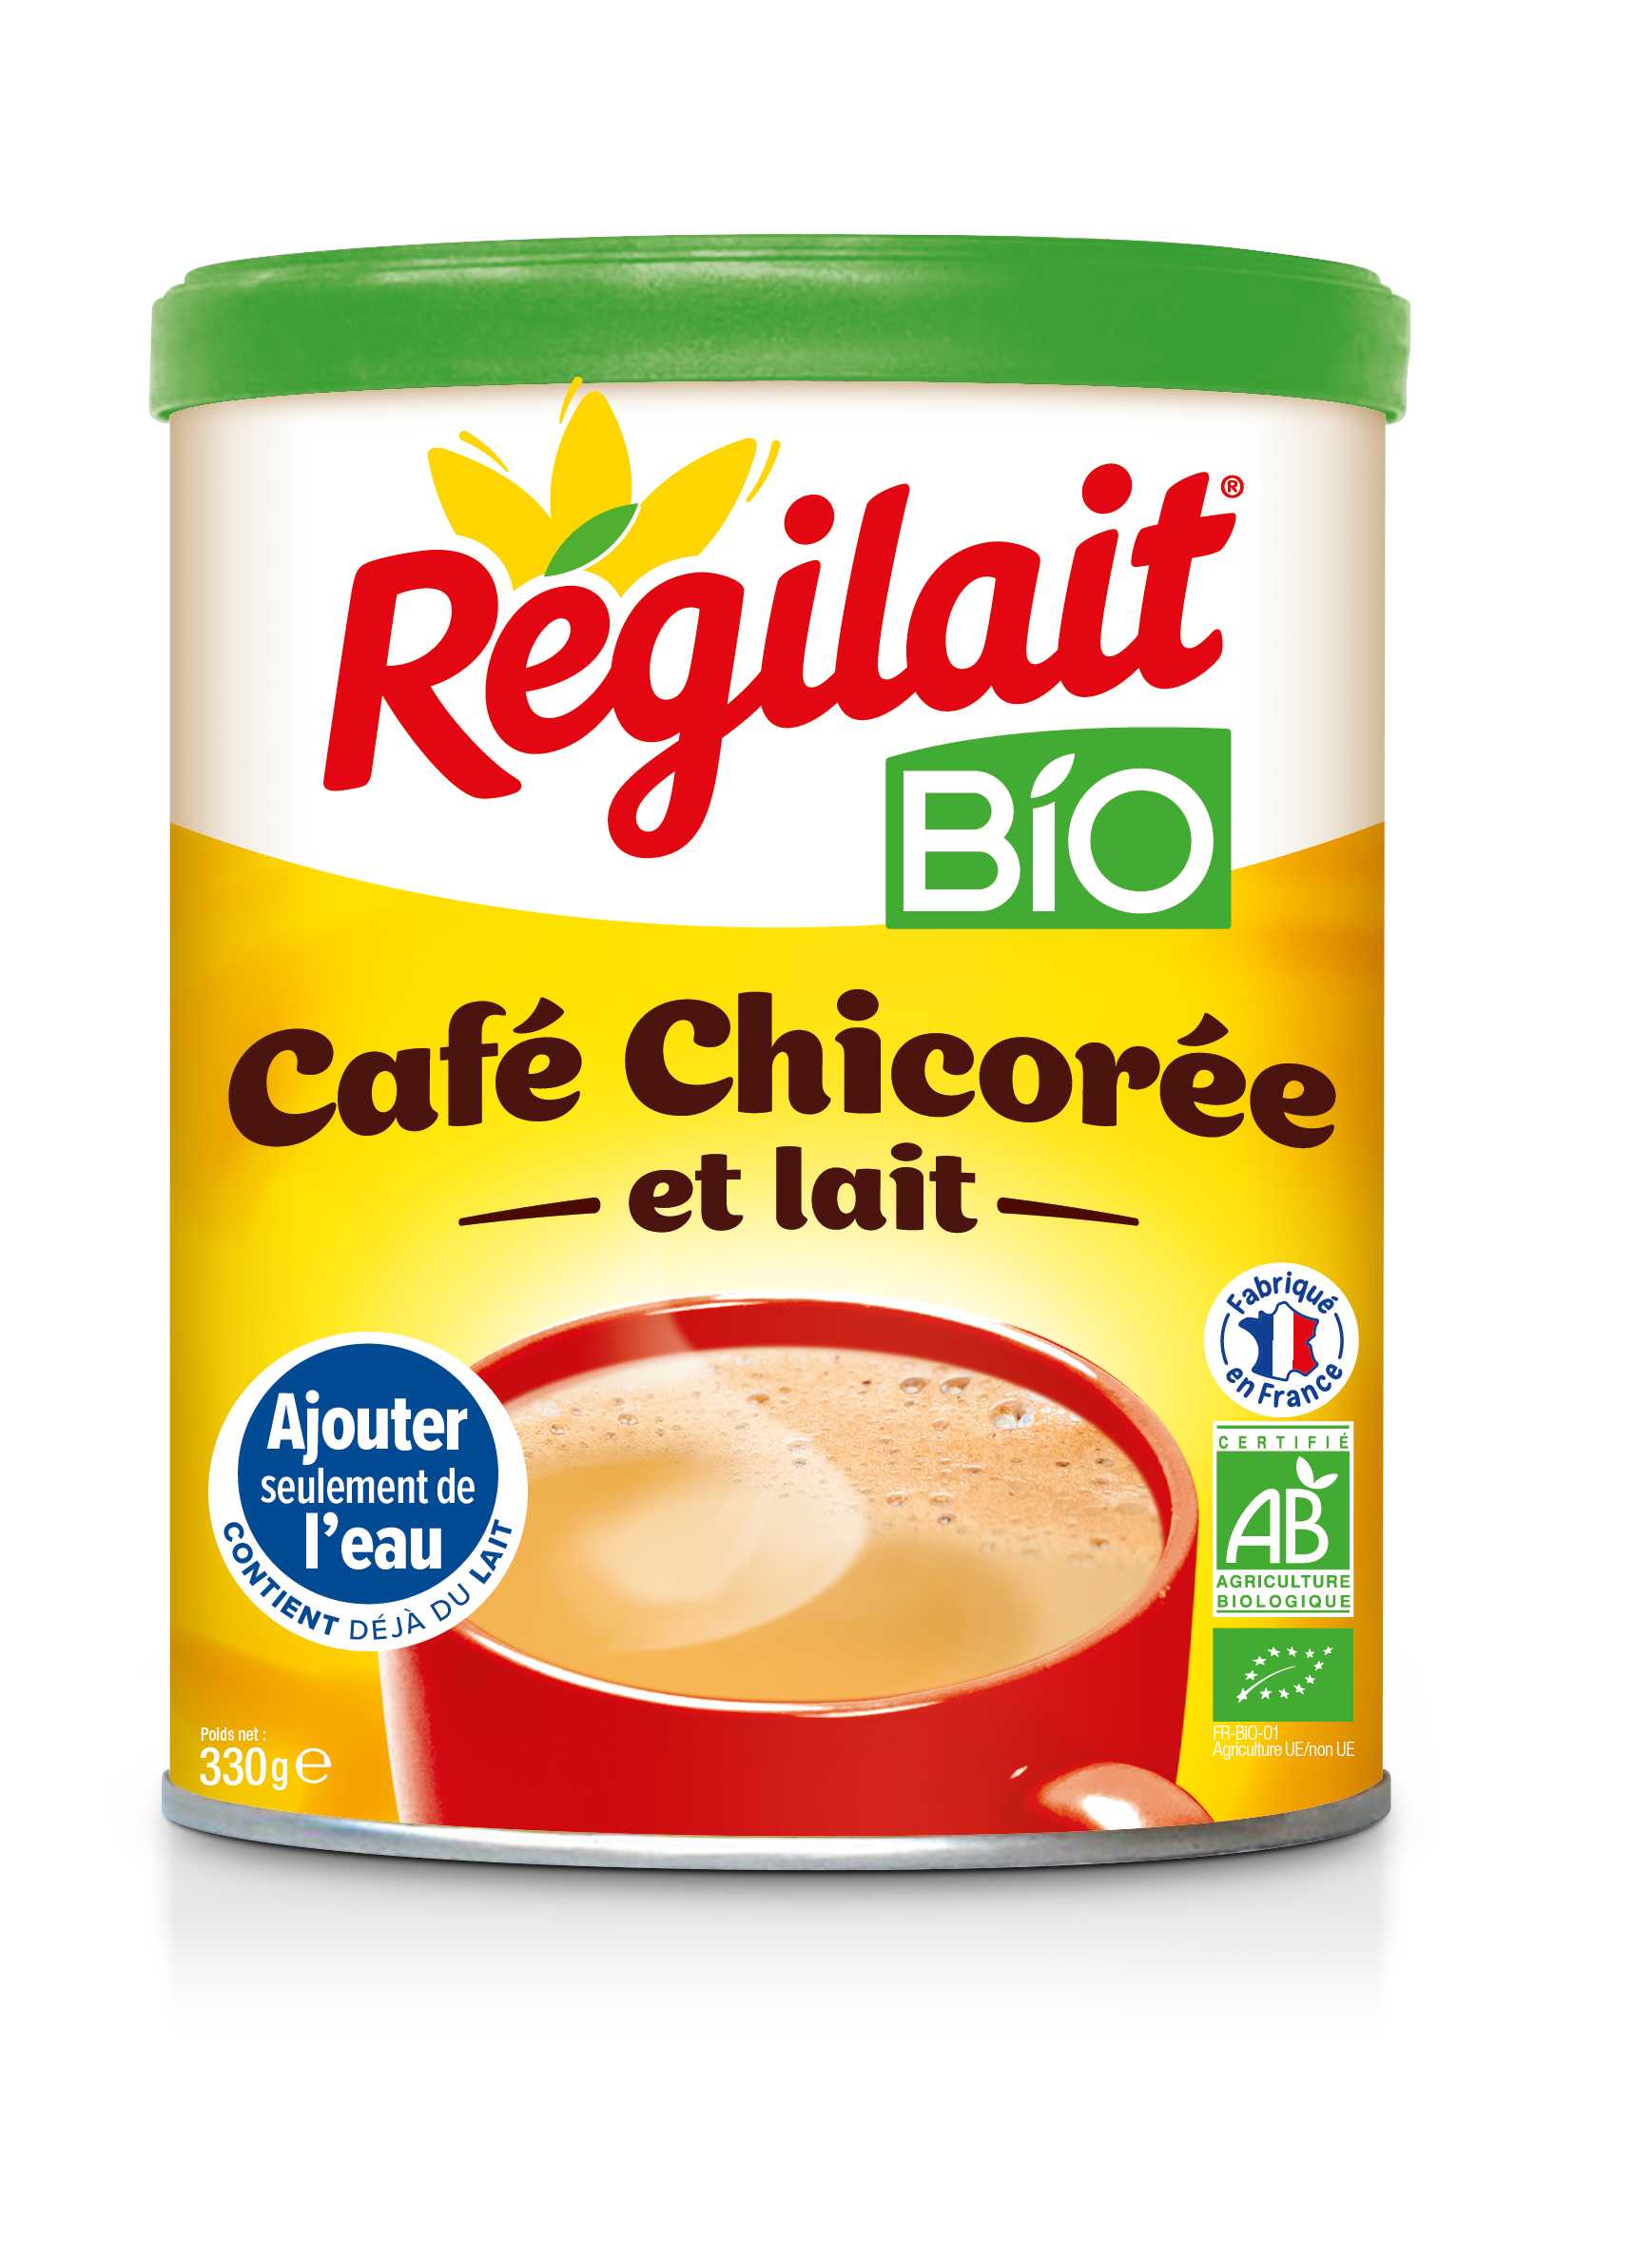 Milk Drinks Bio Cafe Chicoree Lait Digimiam